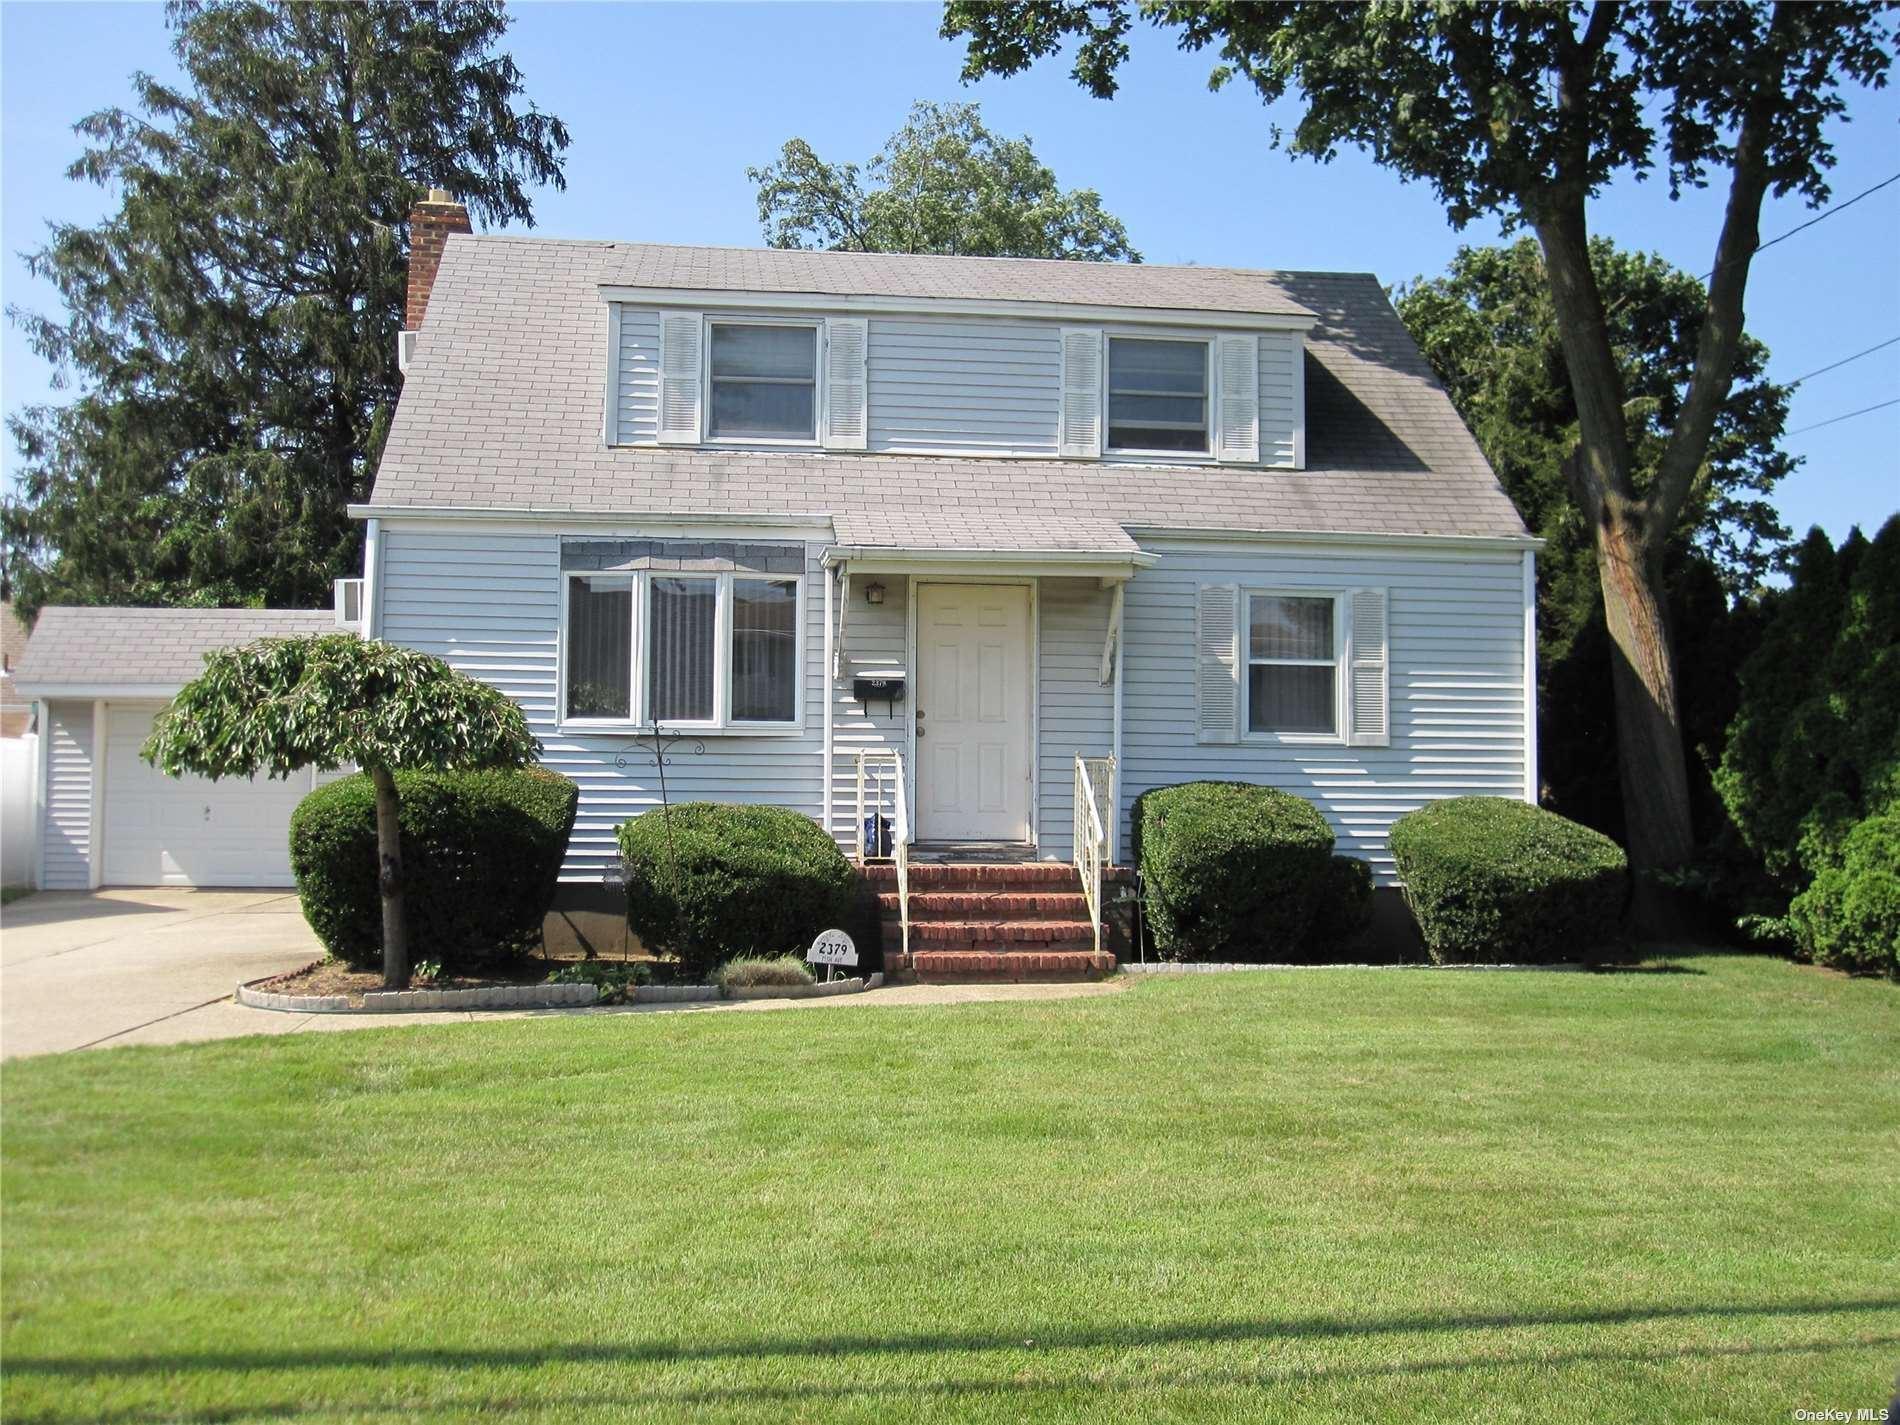 2379 Fish Avenue, North Bellmore, NY 11710 - MLS#: 3337918